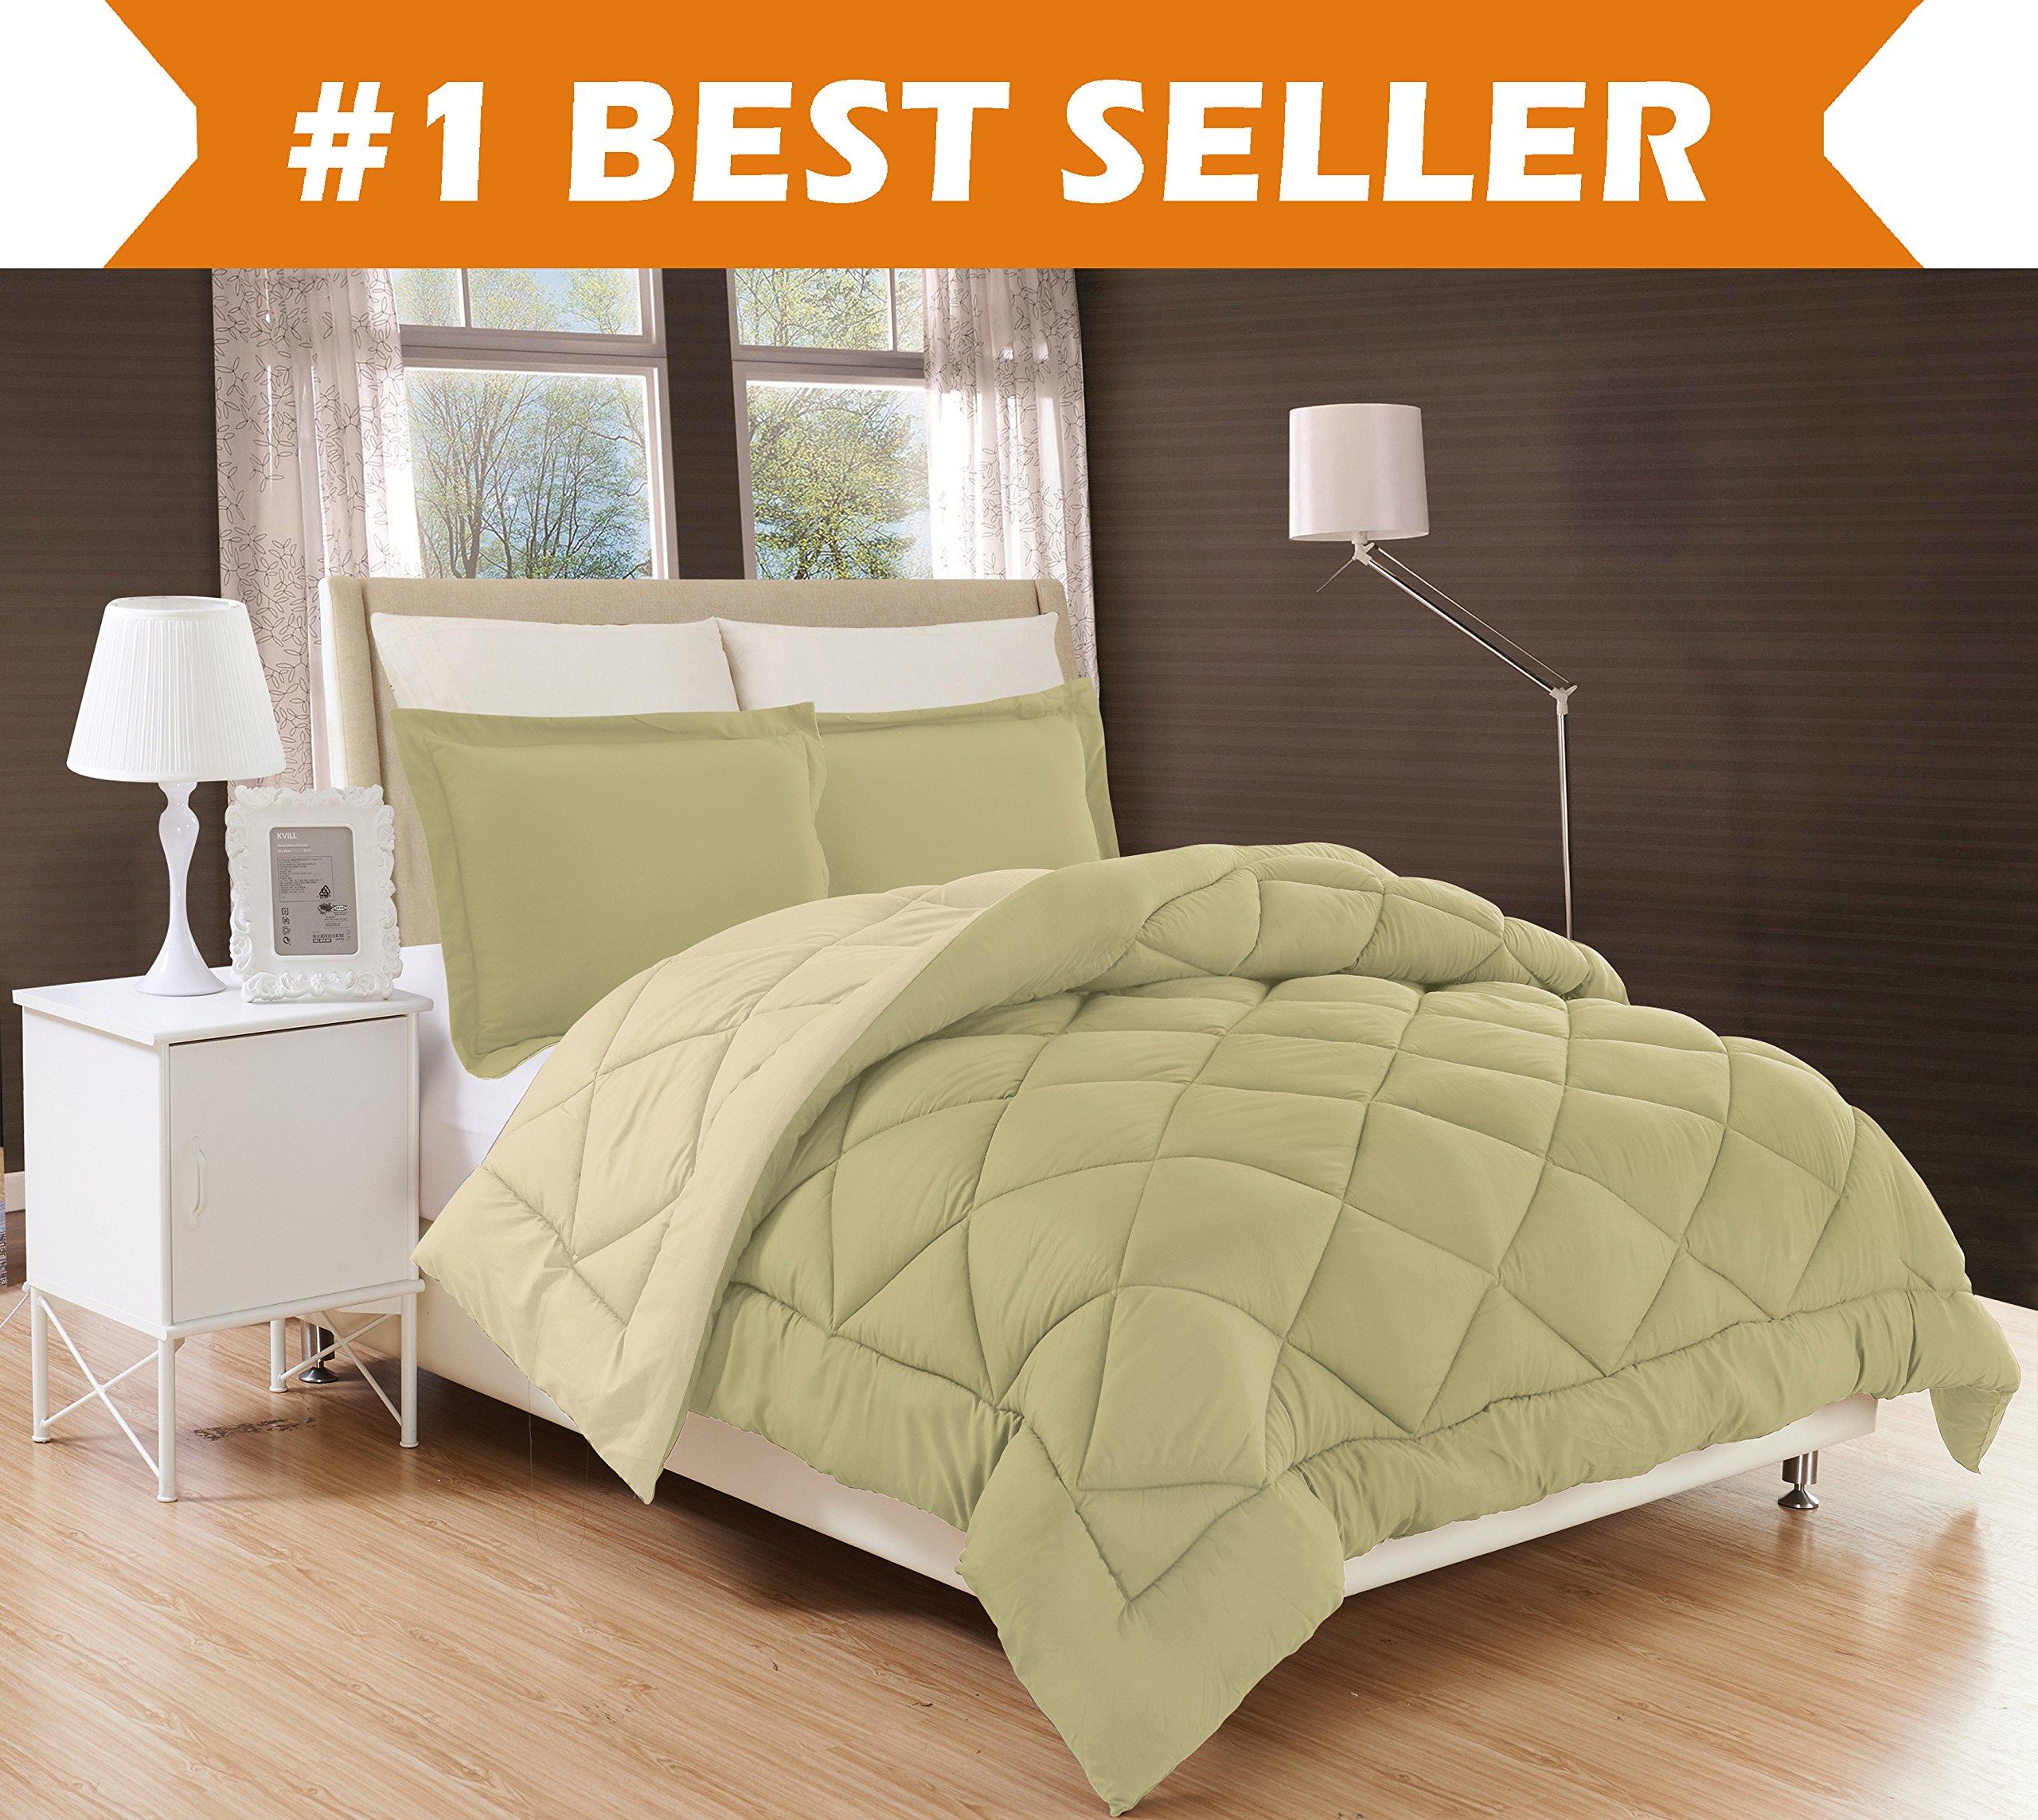 Elegant Comfort All Season Comforter and Year Round Medium Weight Super Soft Down Alternative Reversible 2-Piece Comforter Set, Twin/Twin XL, Sage/Cream